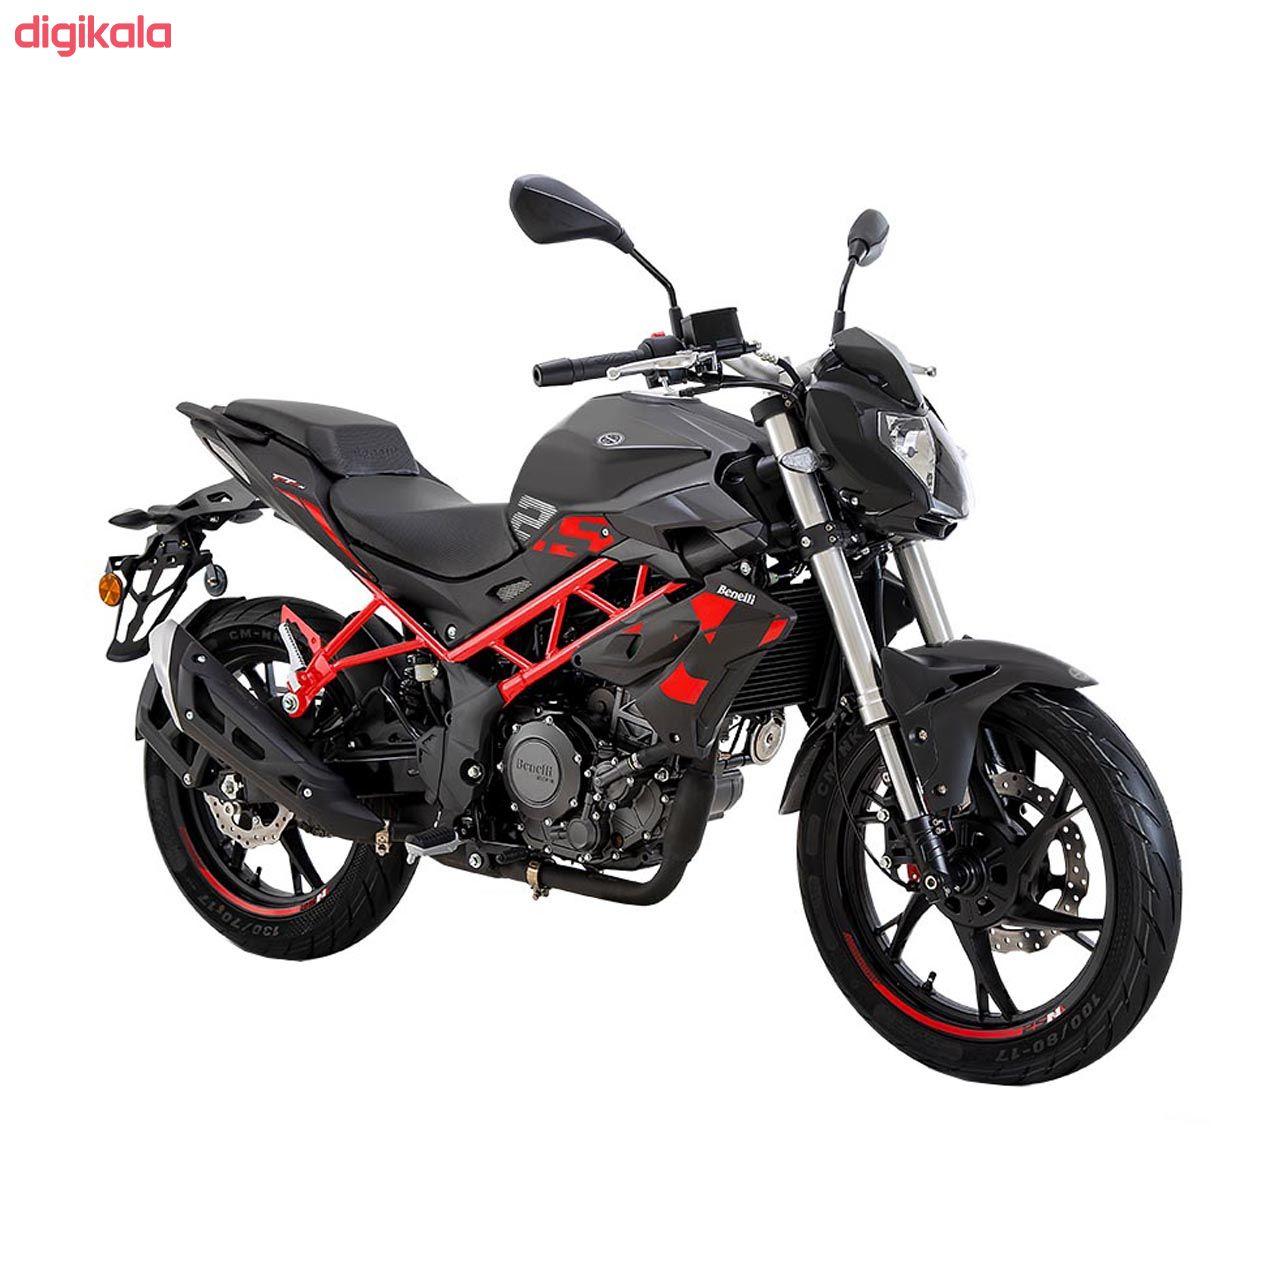 موتورسیکلت بنلی مدل TNT25N سال 1399 main 1 1